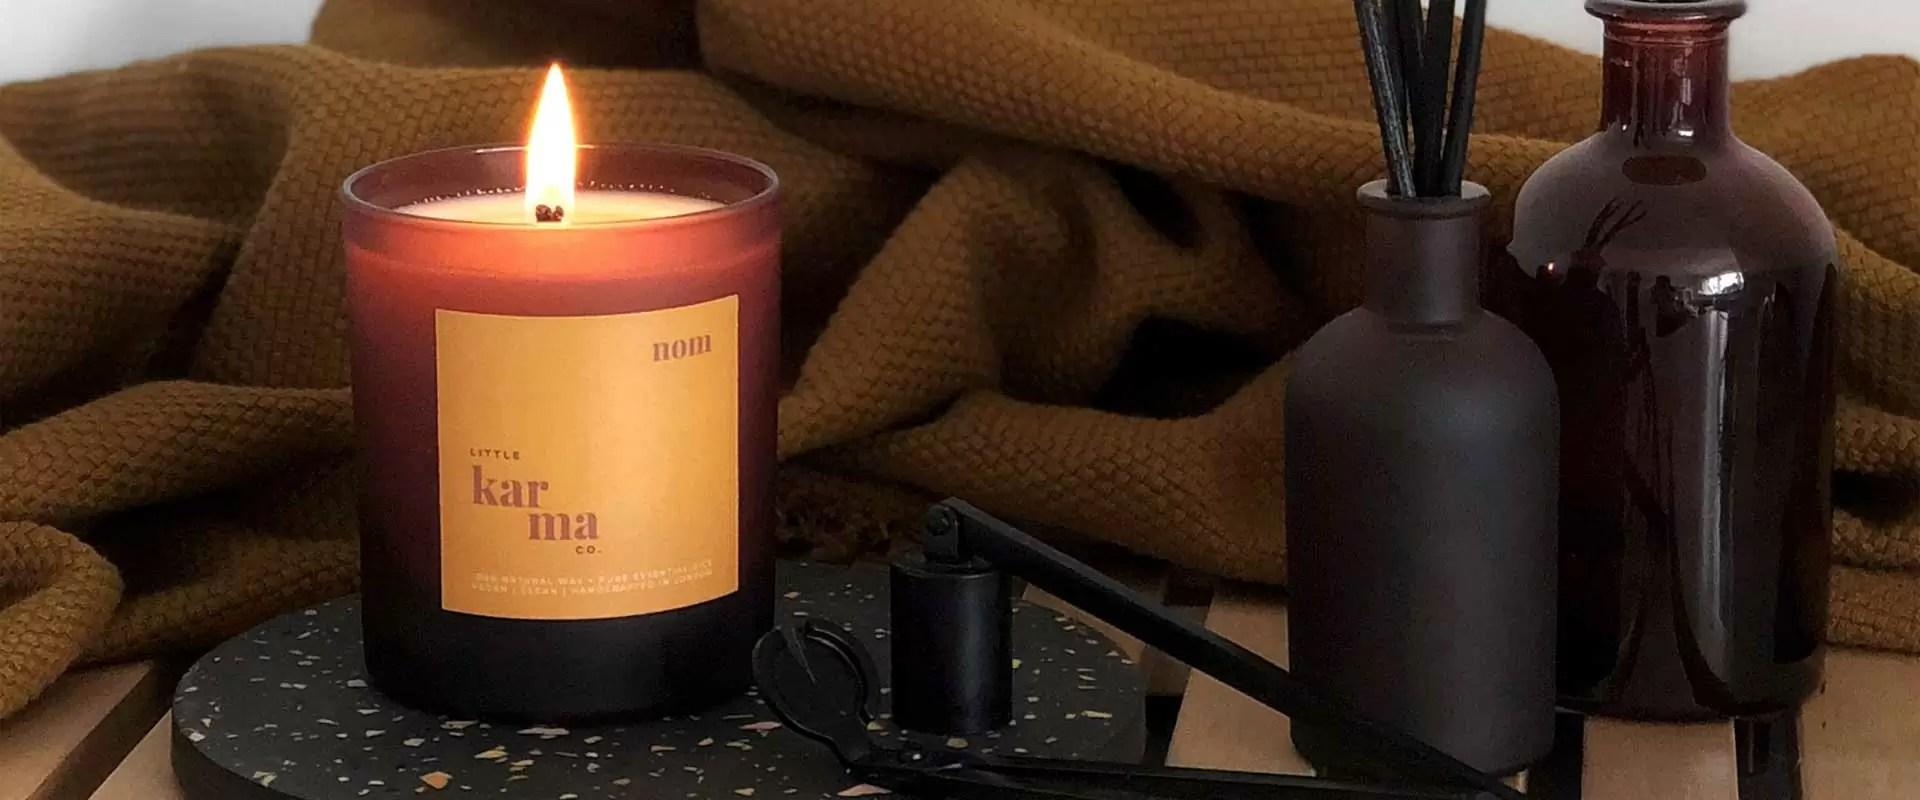 nom uplifting lemongrass ginger large candle in matt finish glass